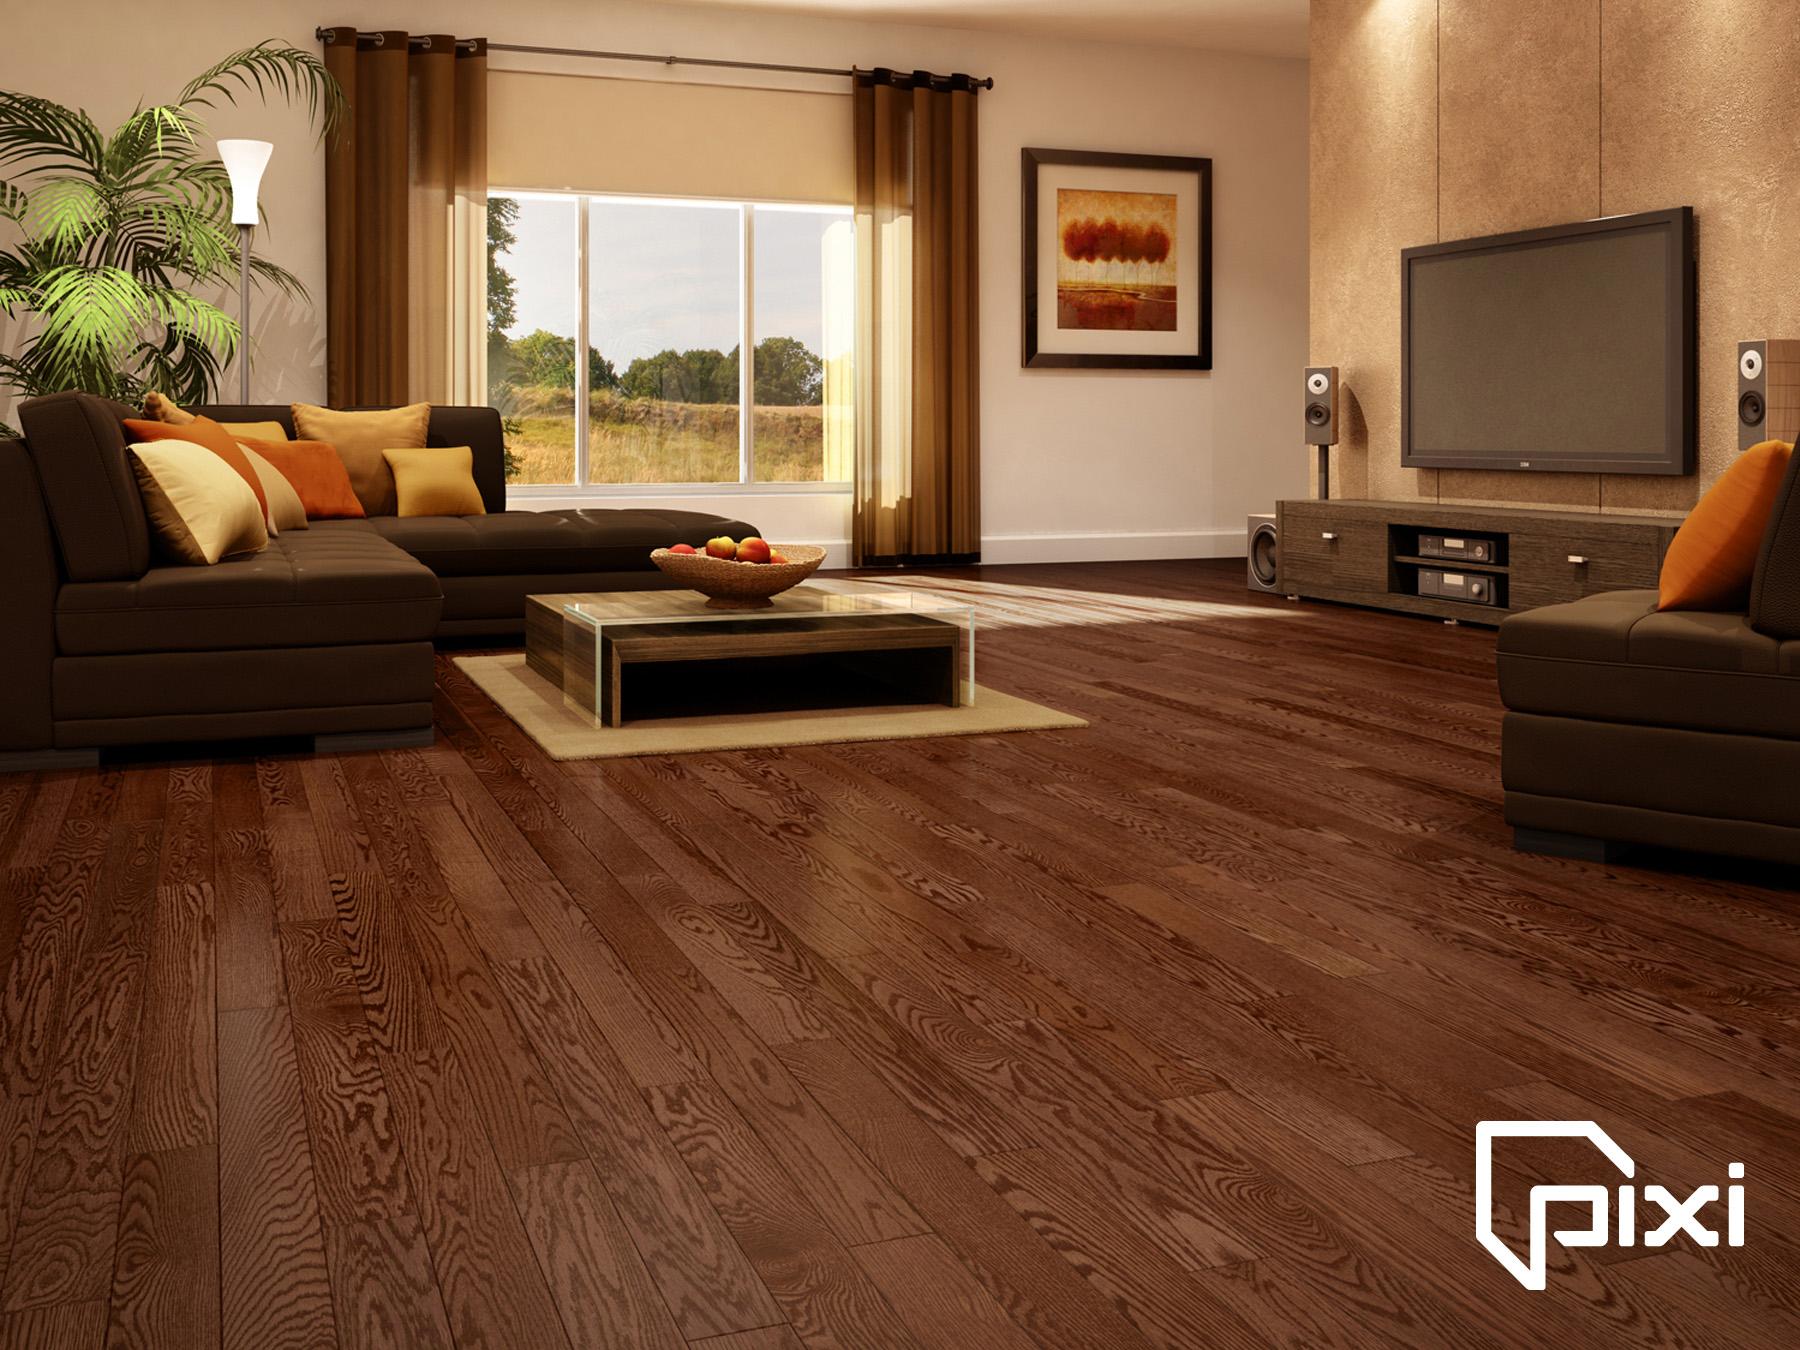 Charming Lauzon Flooring